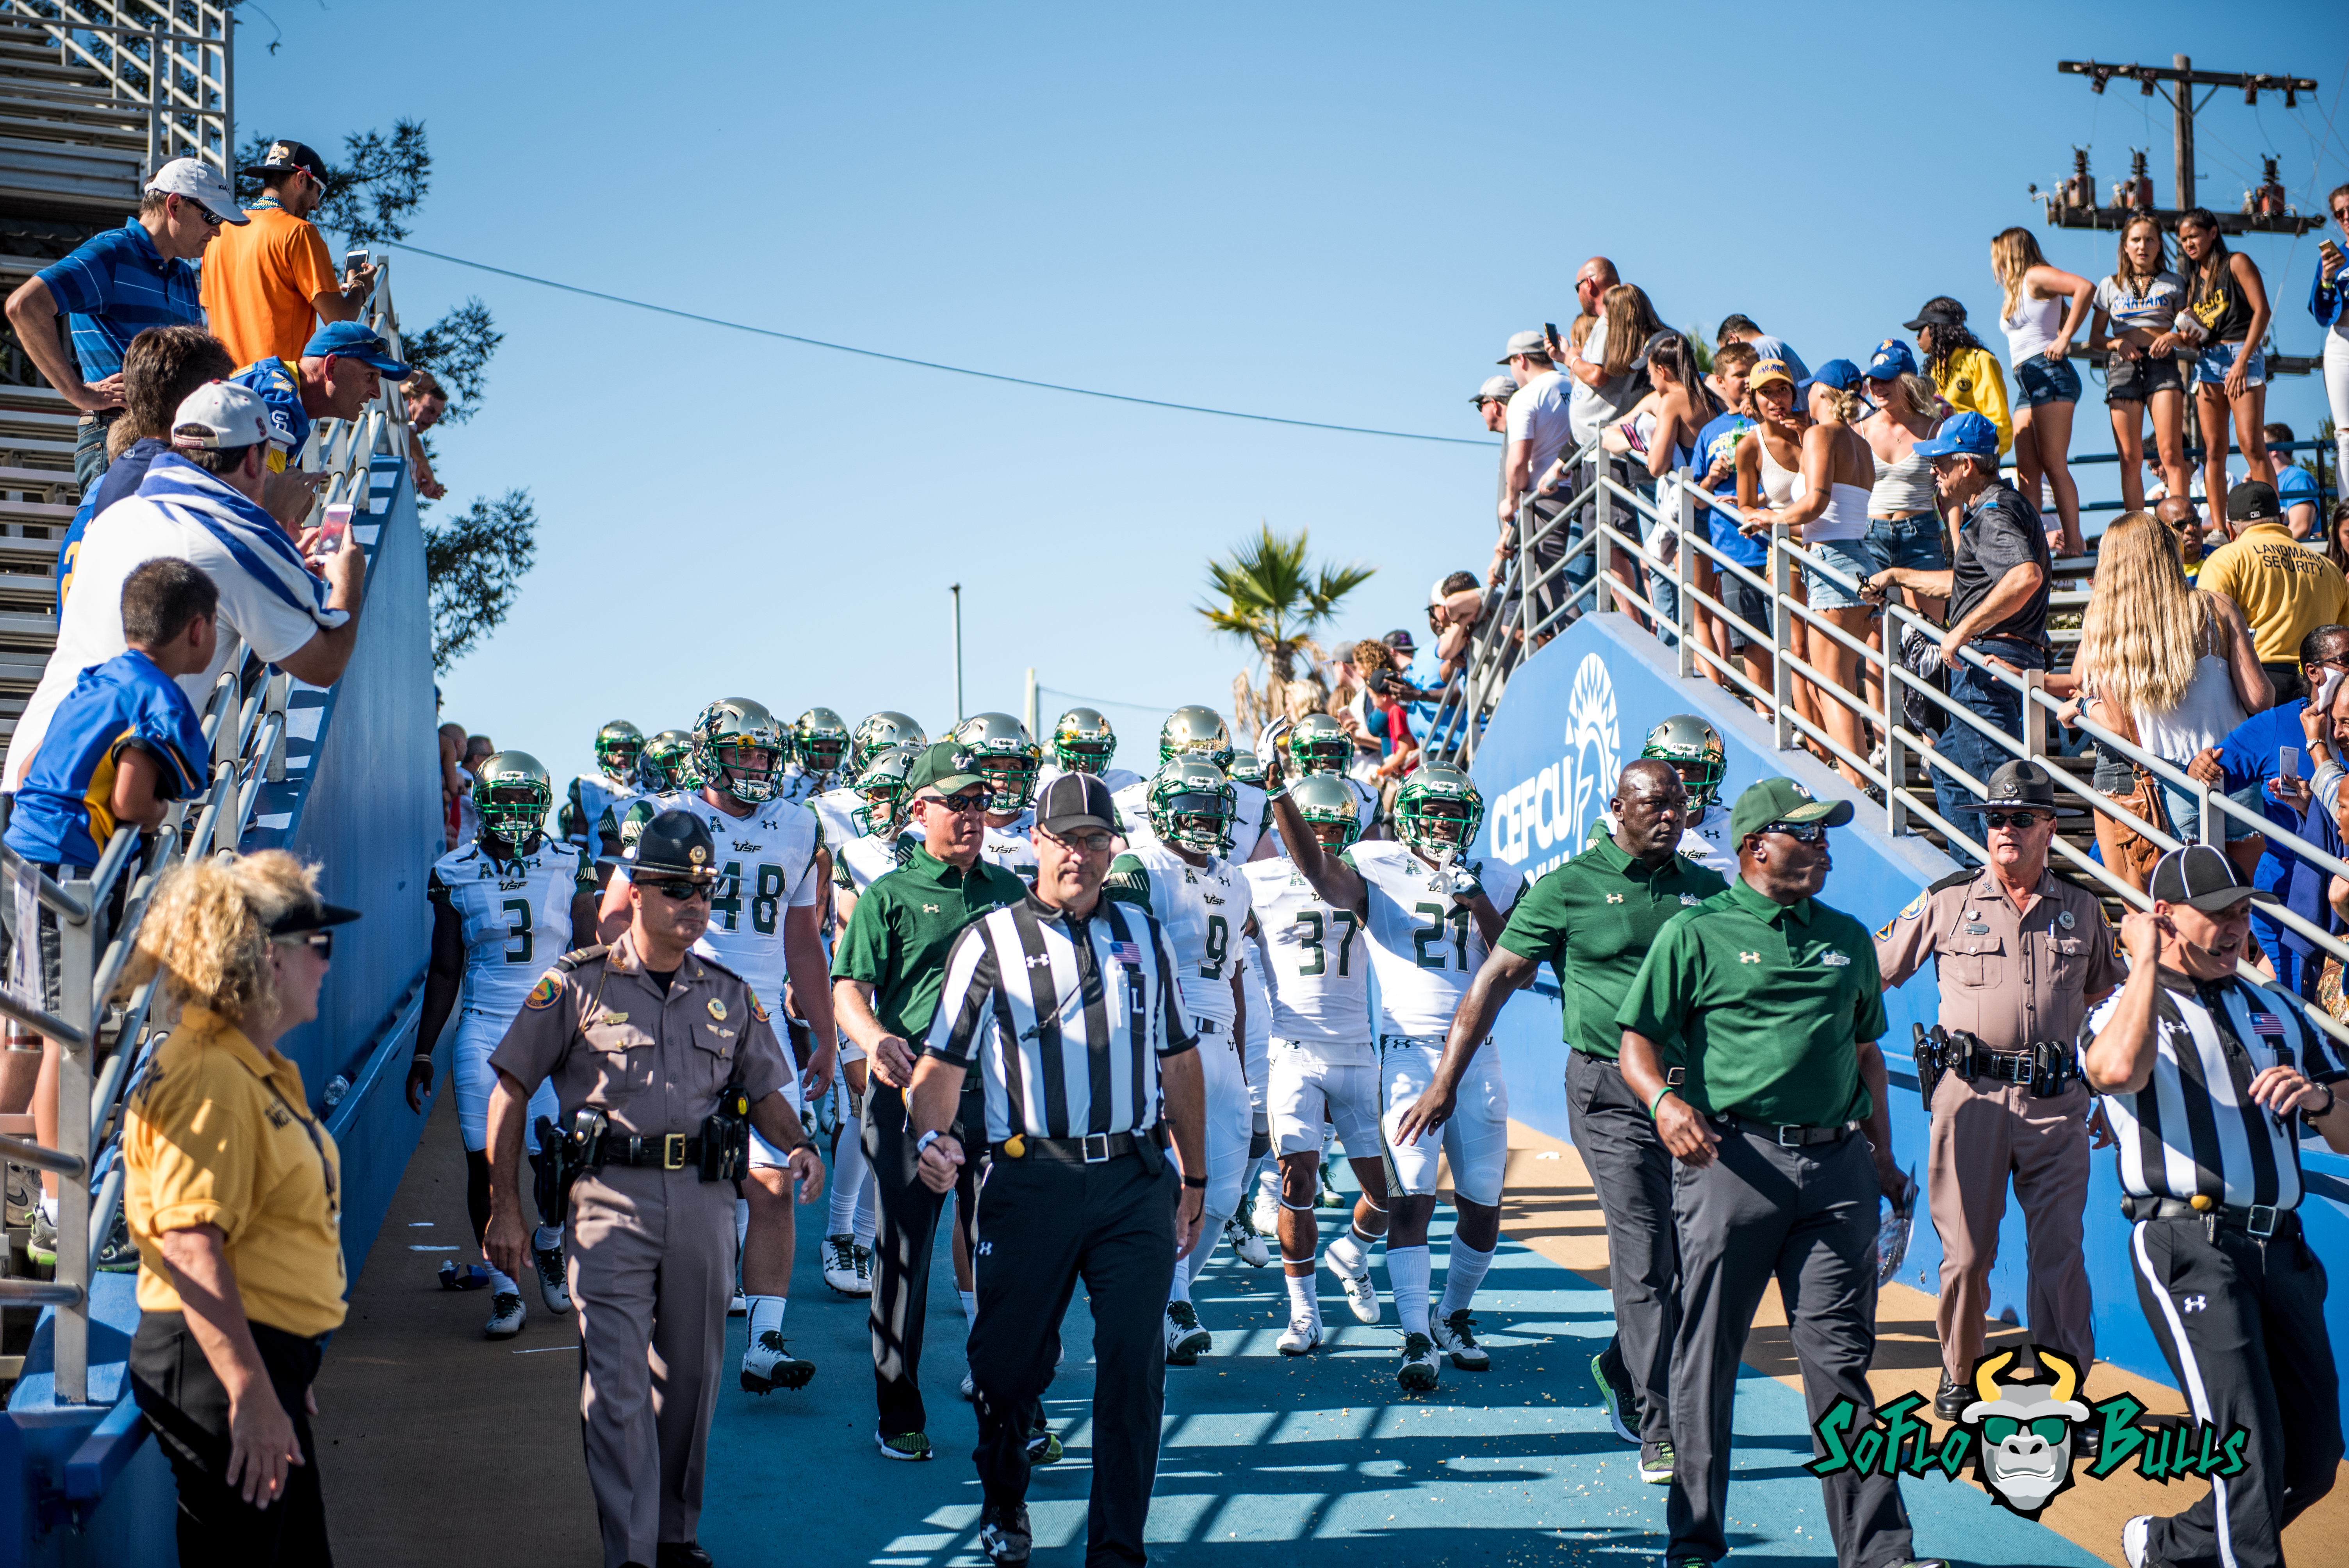 37 - USF vs. San Jose State 2017 - USF QB Quinton Flowers Nate Ferguson Khalid McGee by Dennis Akers | SoFloBulls.com (6010x4016)